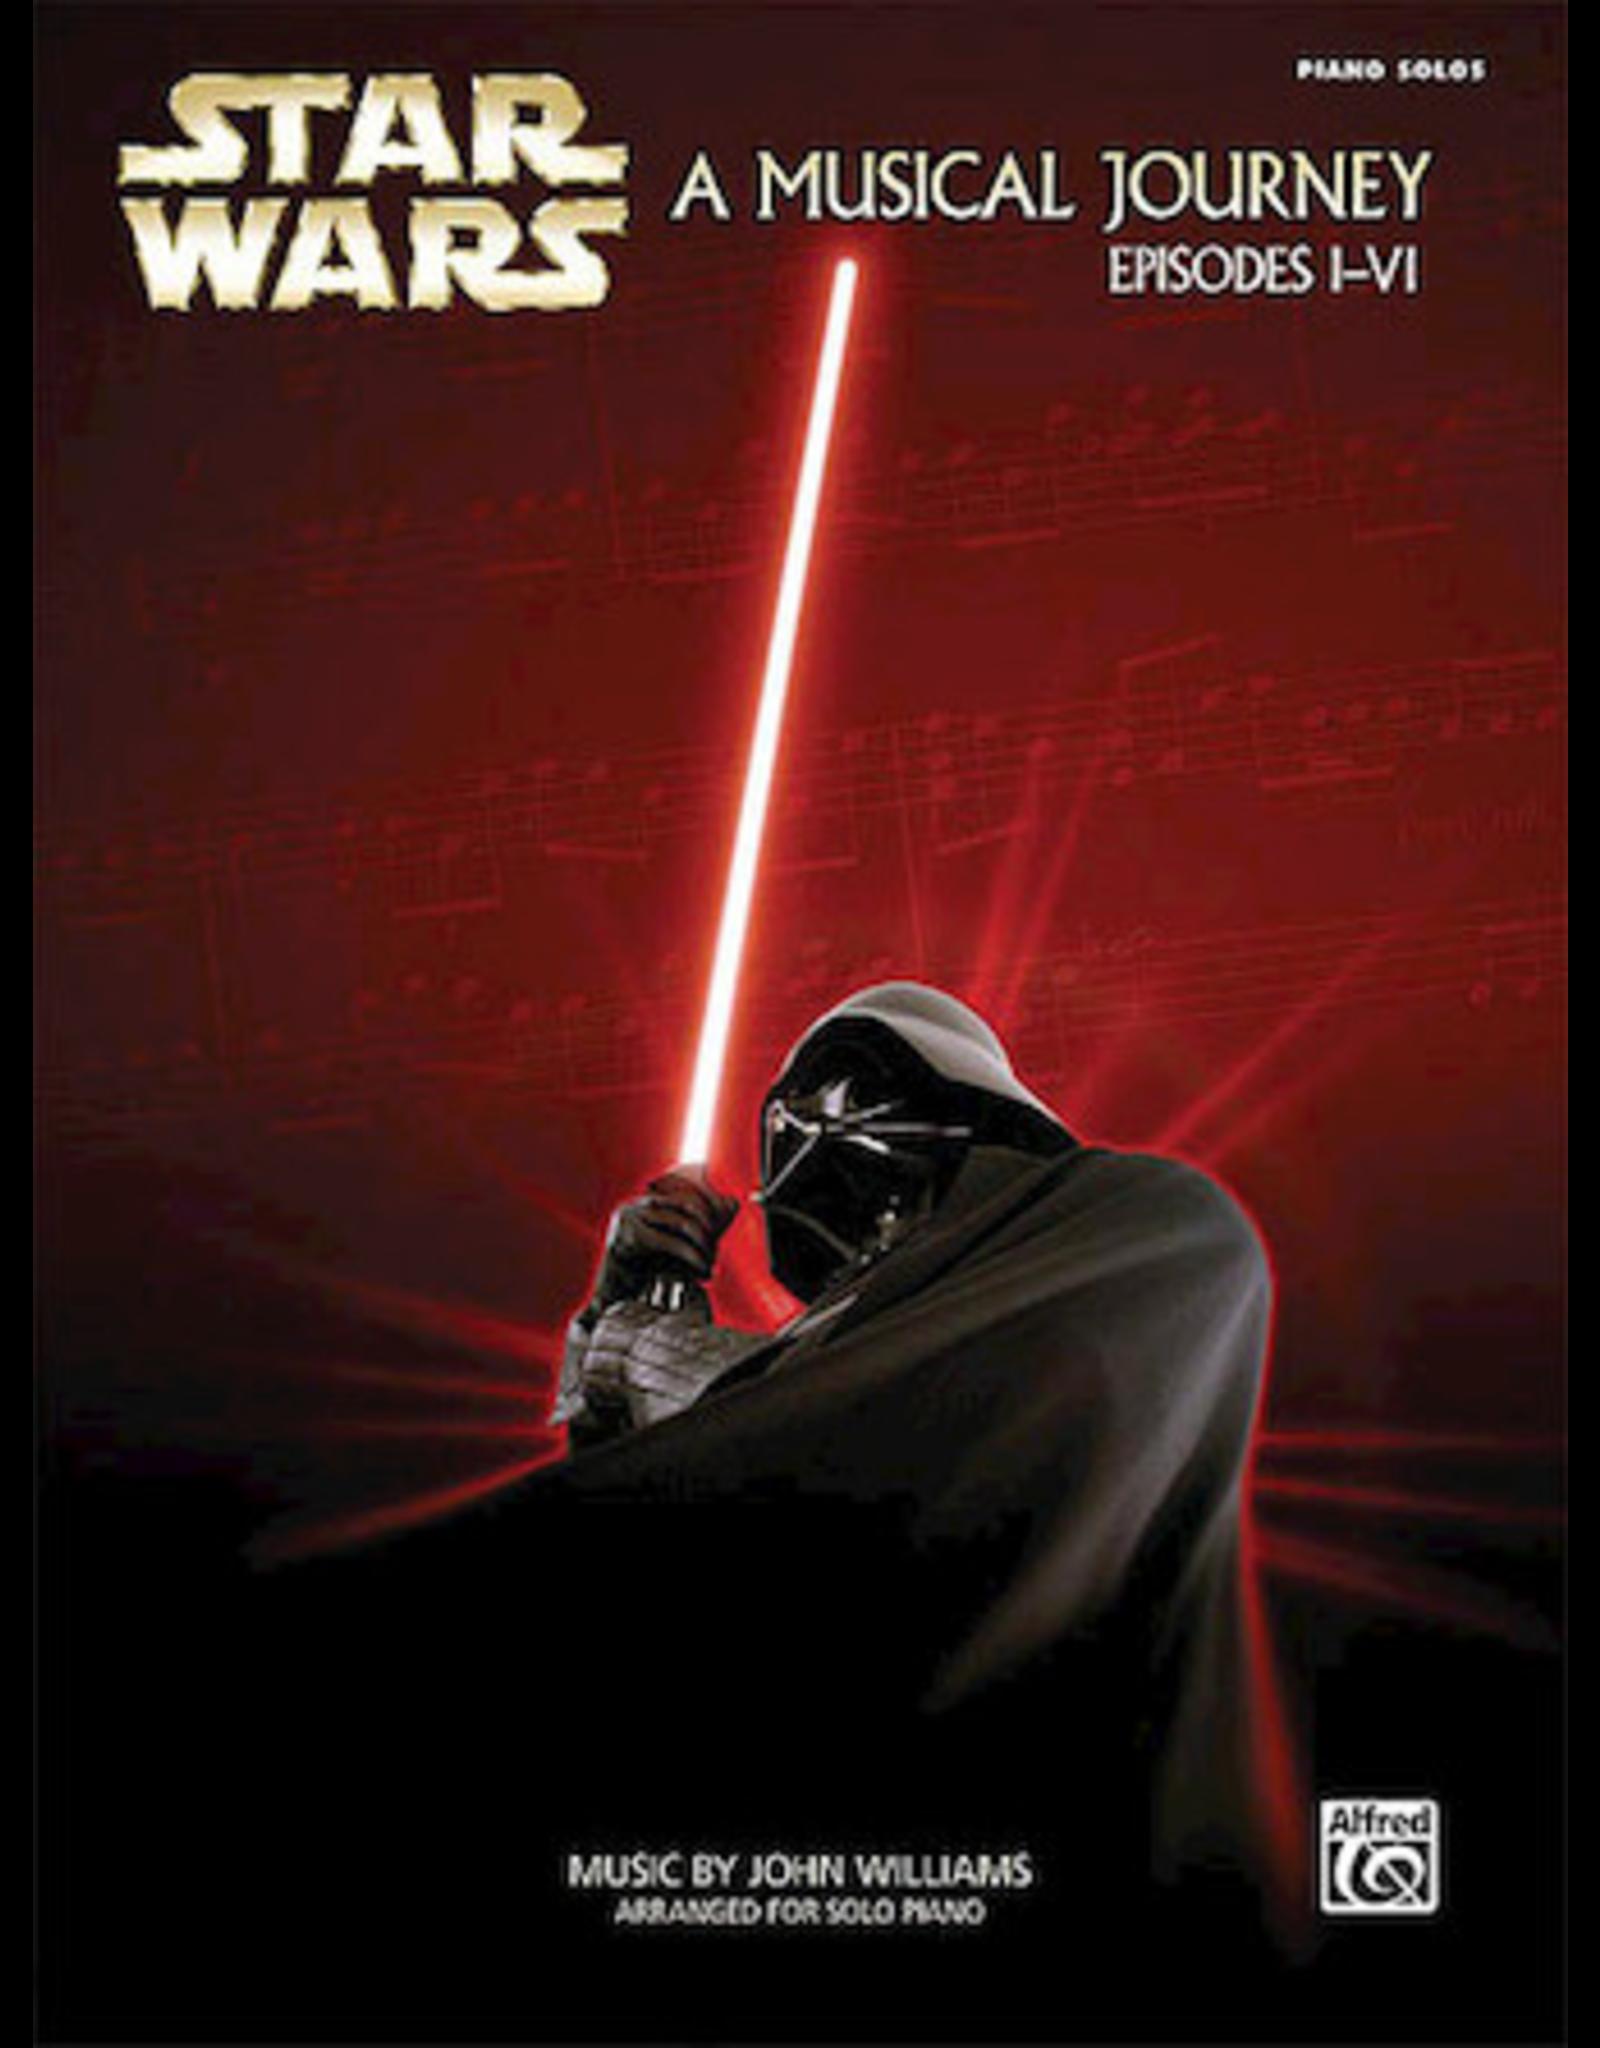 Hal Leonard Star Wars: A Musical Journey Music from Episodes I-VI